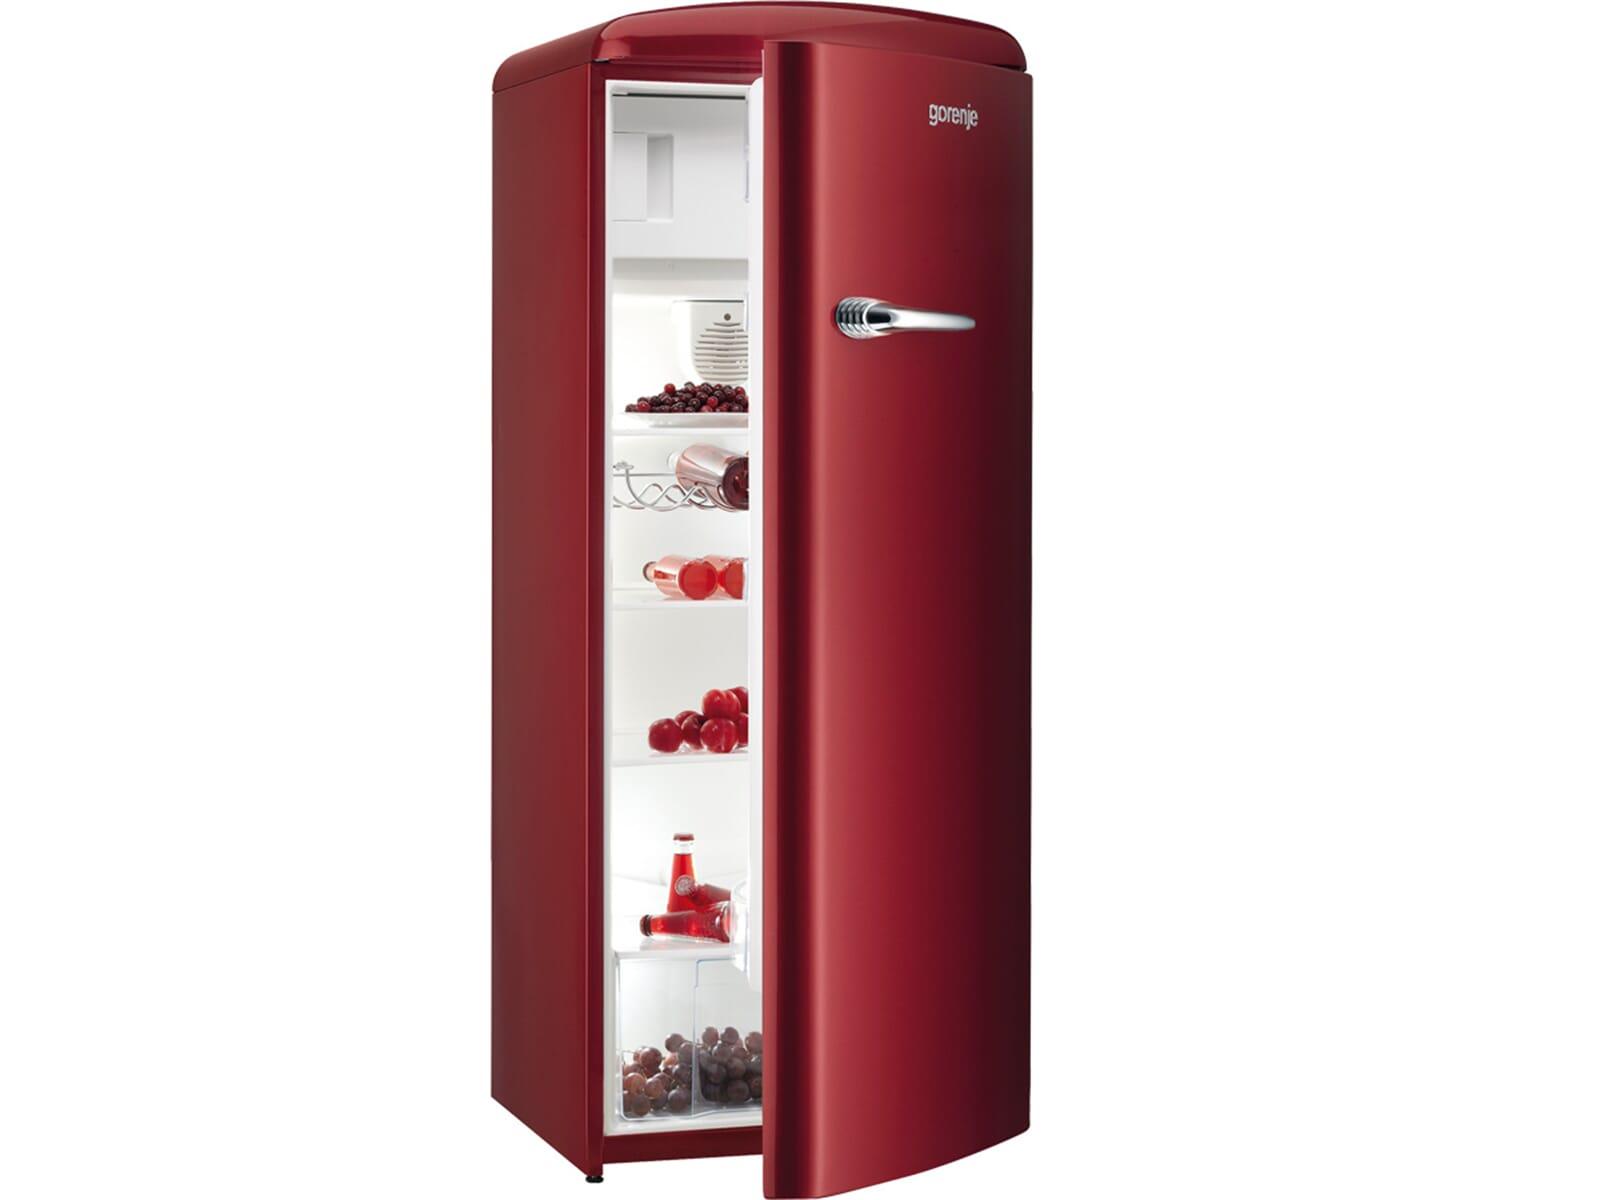 Retro Kühlschrank Billig : Kühlschrank retro günstig ᐅ retro kühlschrank smeg fab rr rot